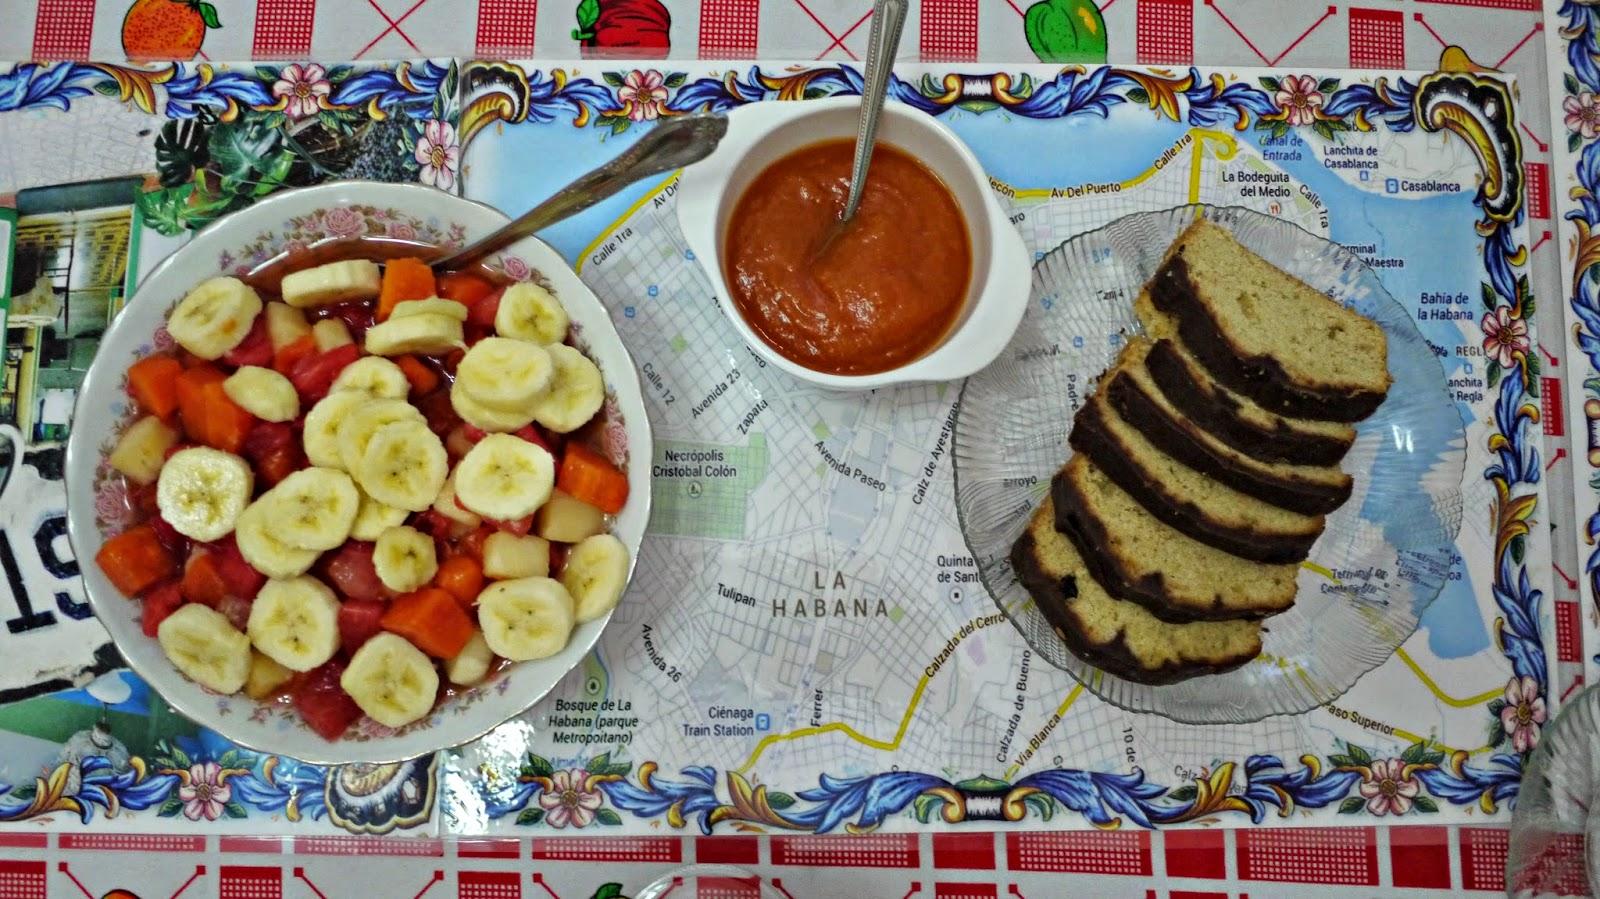 Casa cristo colonial breakfast cuba